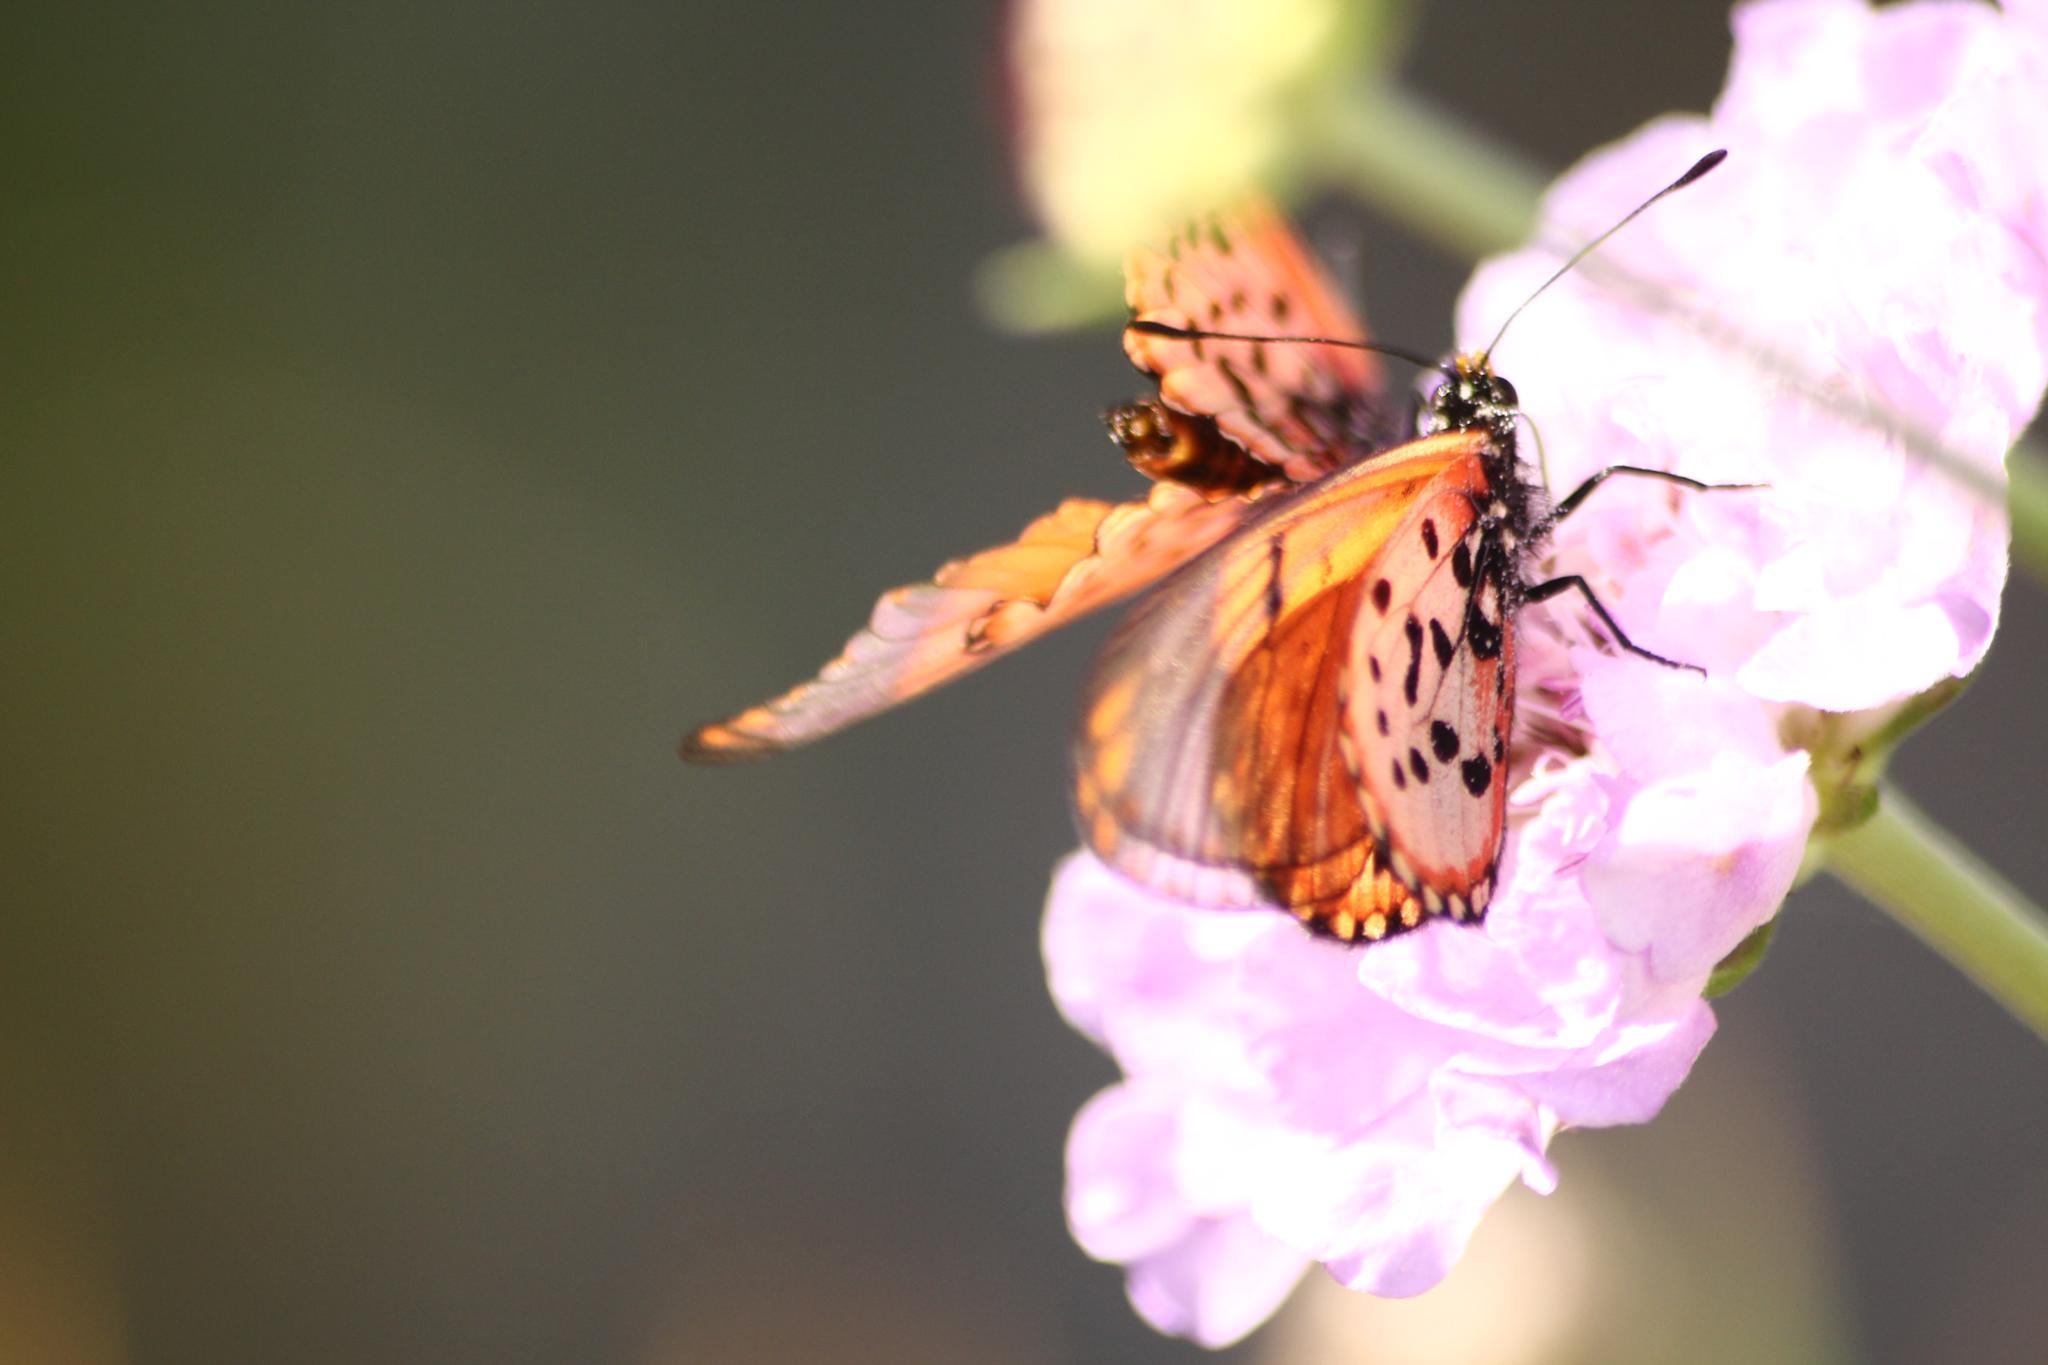 The butterflies by Judithstopforth